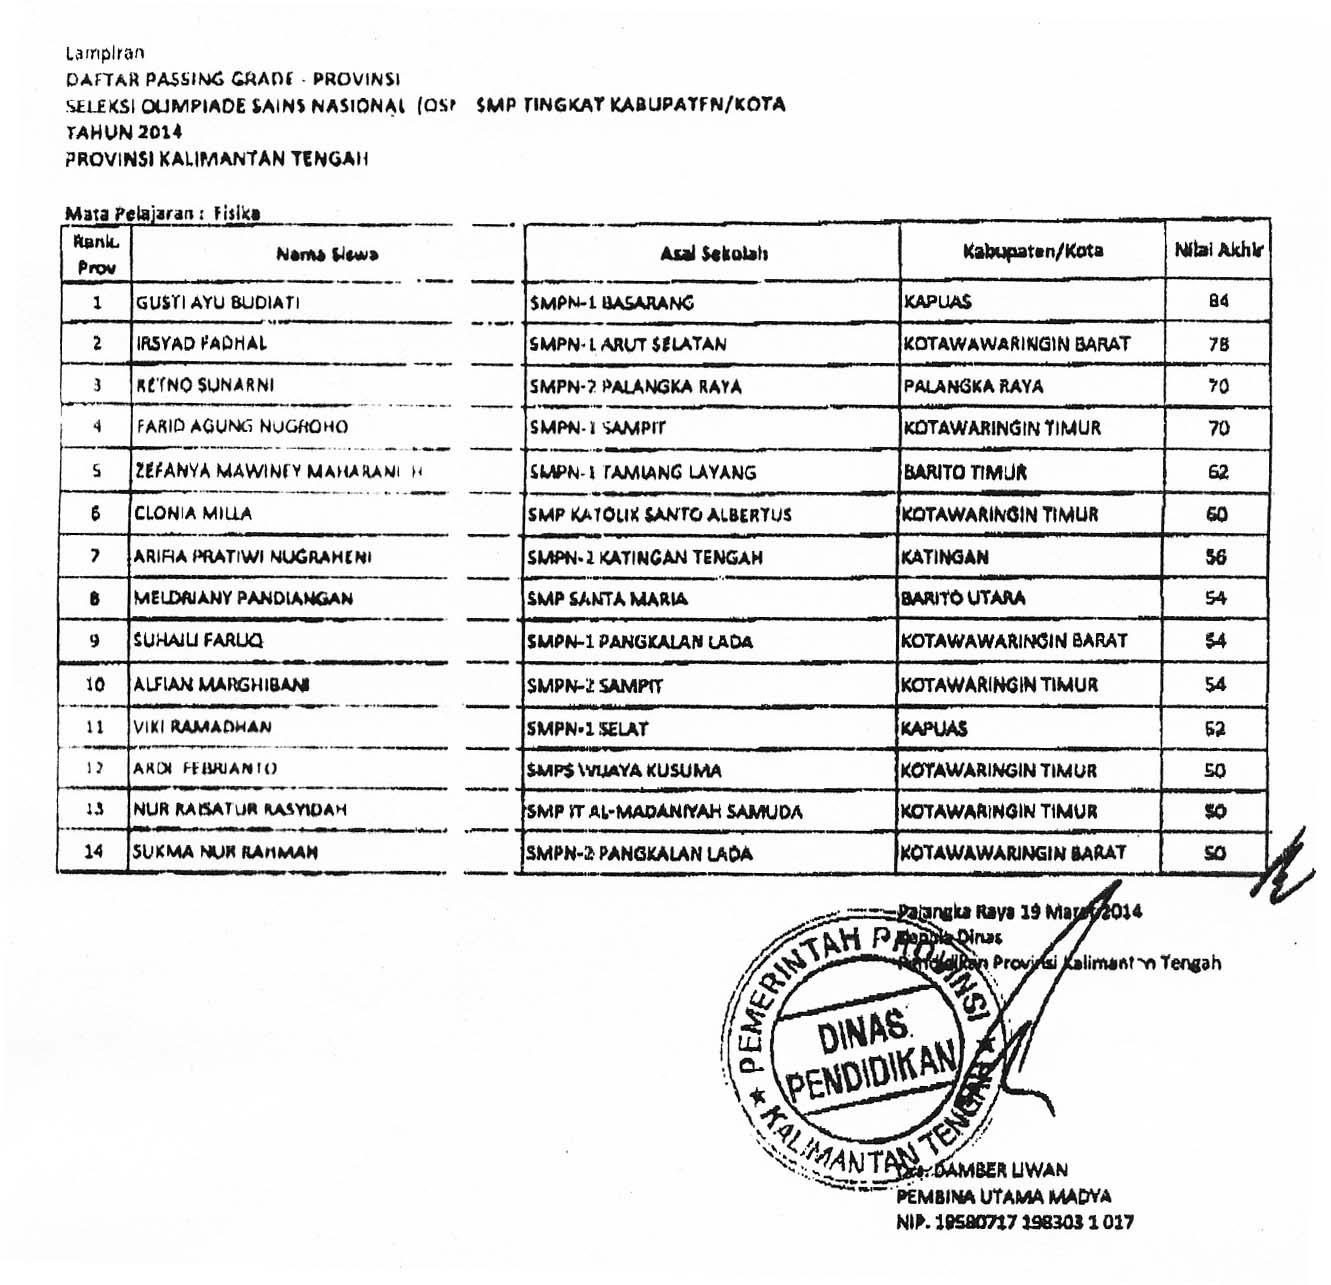 Hasil Seleksi Olimpiade Sains Osn Smp Tingkat Kab Kota Provinsi Kalimantan Tengah 2014 Blog Urip Guru Kimia